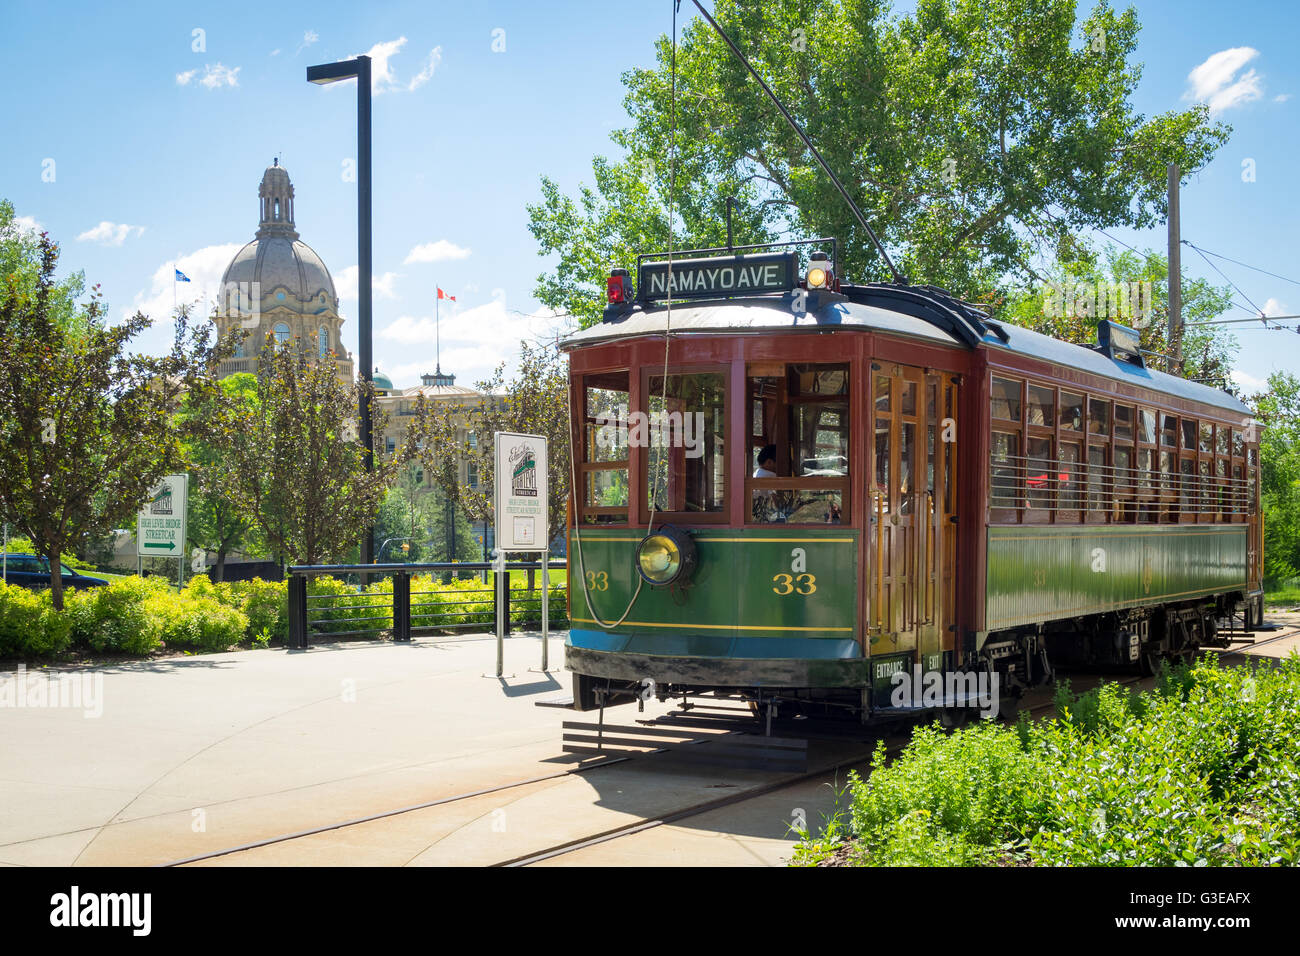 The High Level Bridge Streetcar in Edmonton, Alberta, Canada. Edmonton Streetcar #33 shown; Alberta Legislature - Stock Image